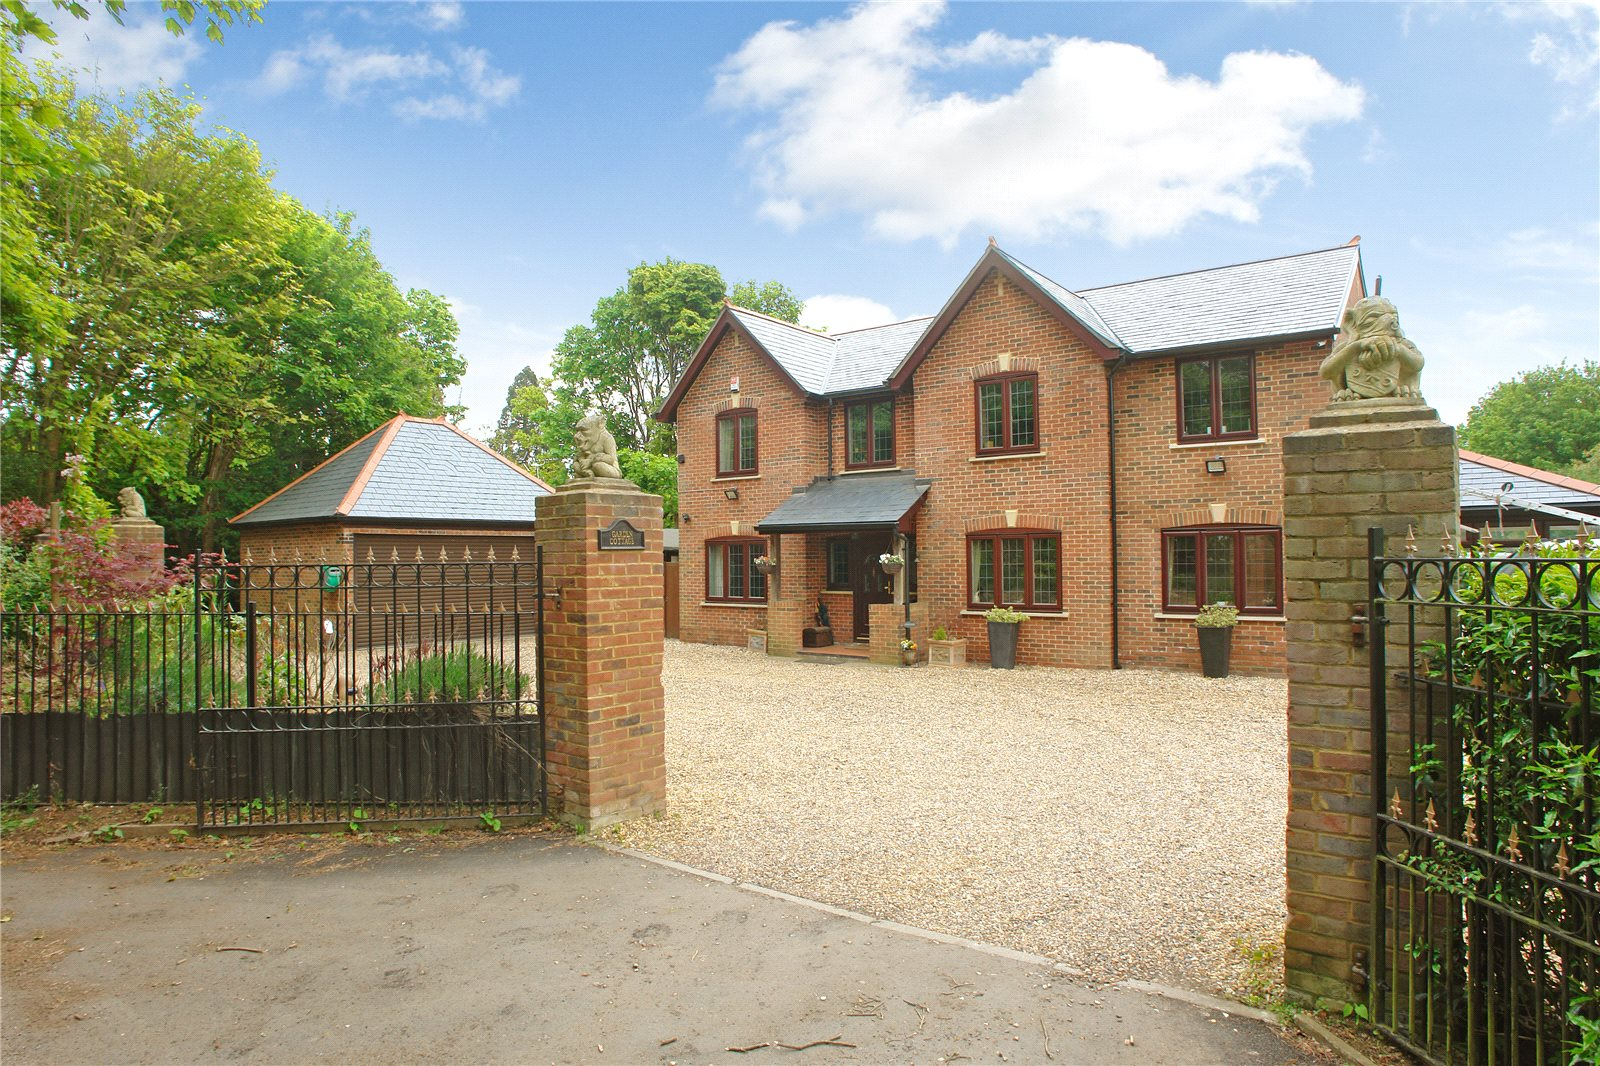 Vivienda unifamiliar por un Venta en Danesbury Park Road, Welwyn, Hertfordshire, AL6 Welwyn, Inglaterra